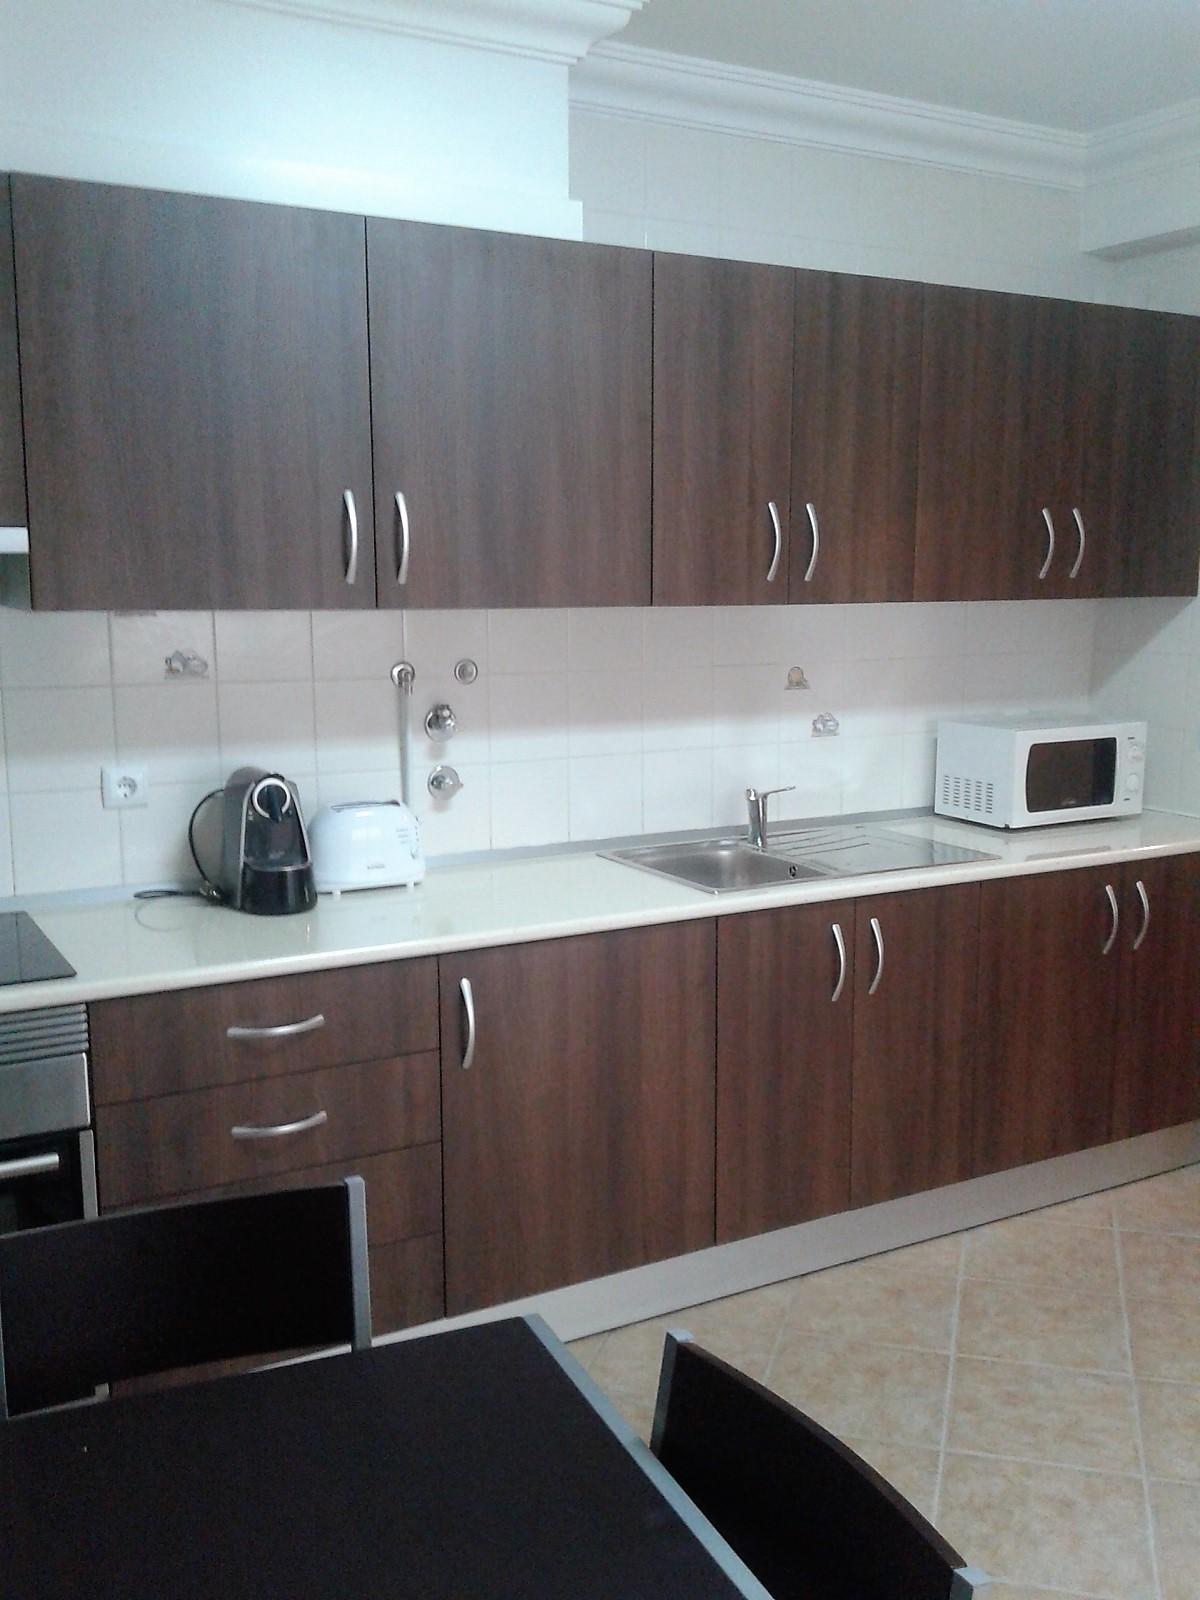 Holiday apartments and villas for rent, CASA NEUZA in Fuzeta, Portugal Algarve, REF_IMG_4092_4100